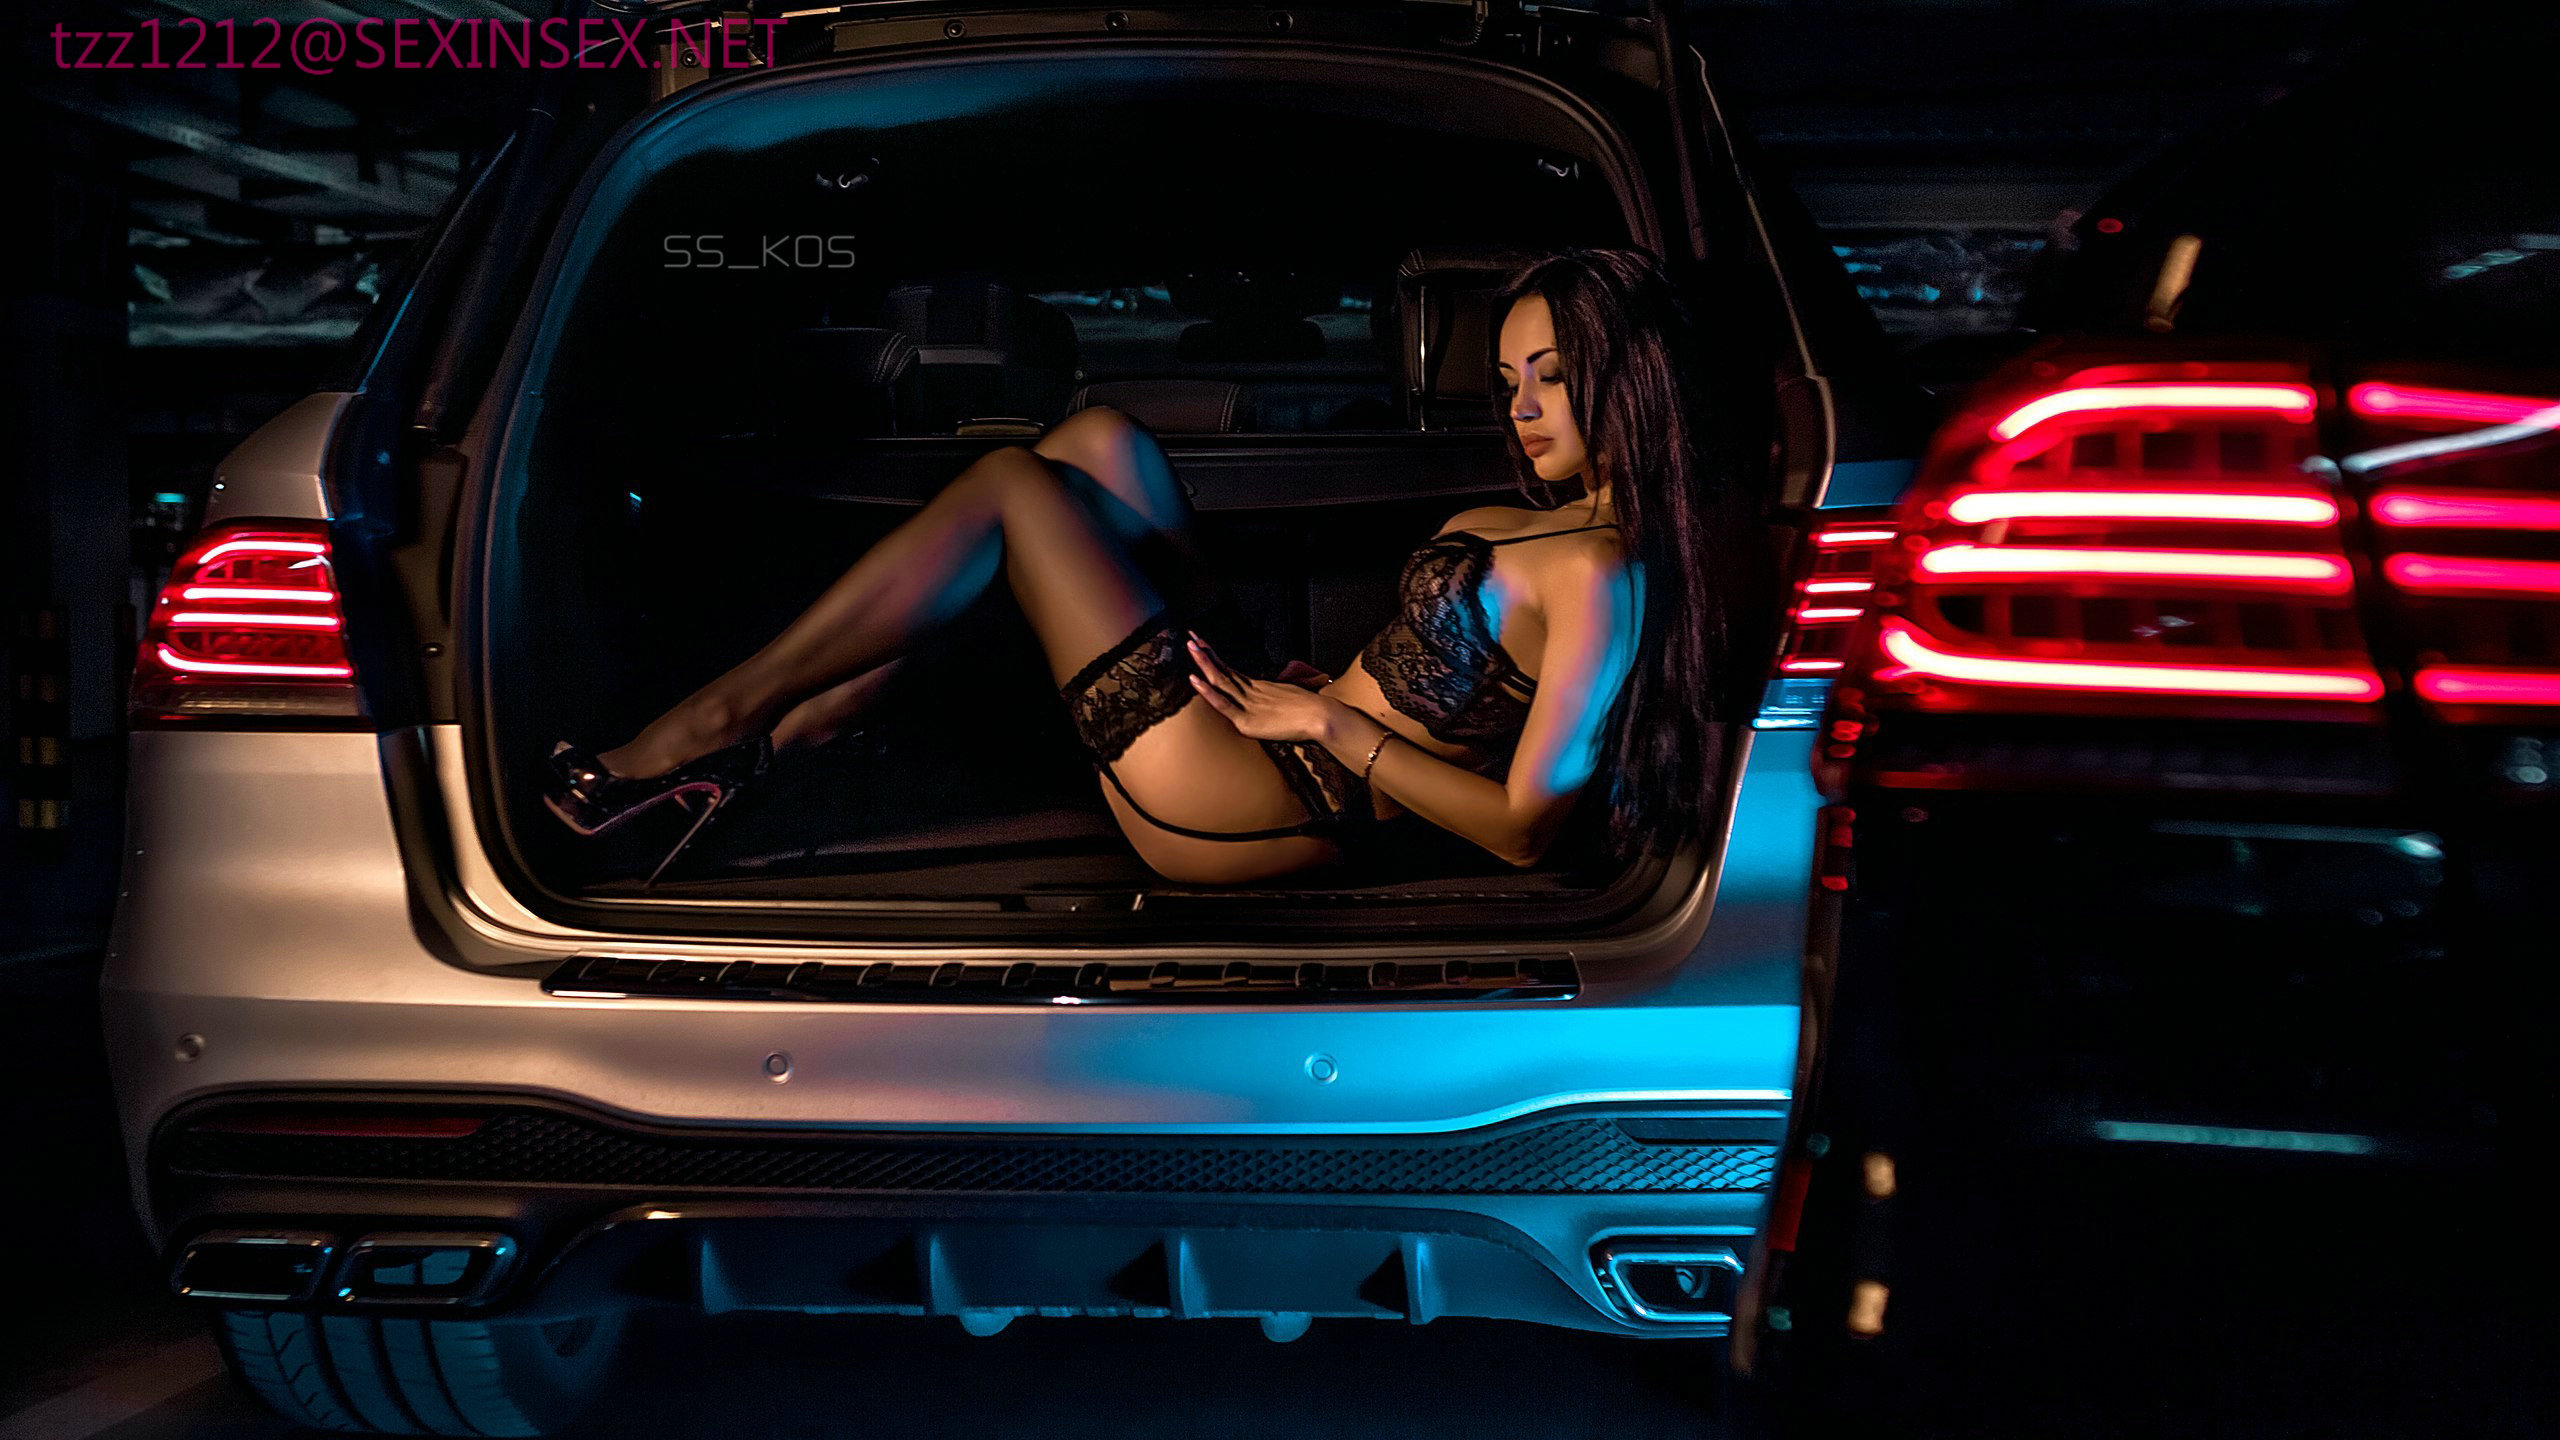 девушка на багажнике мустанга без смс